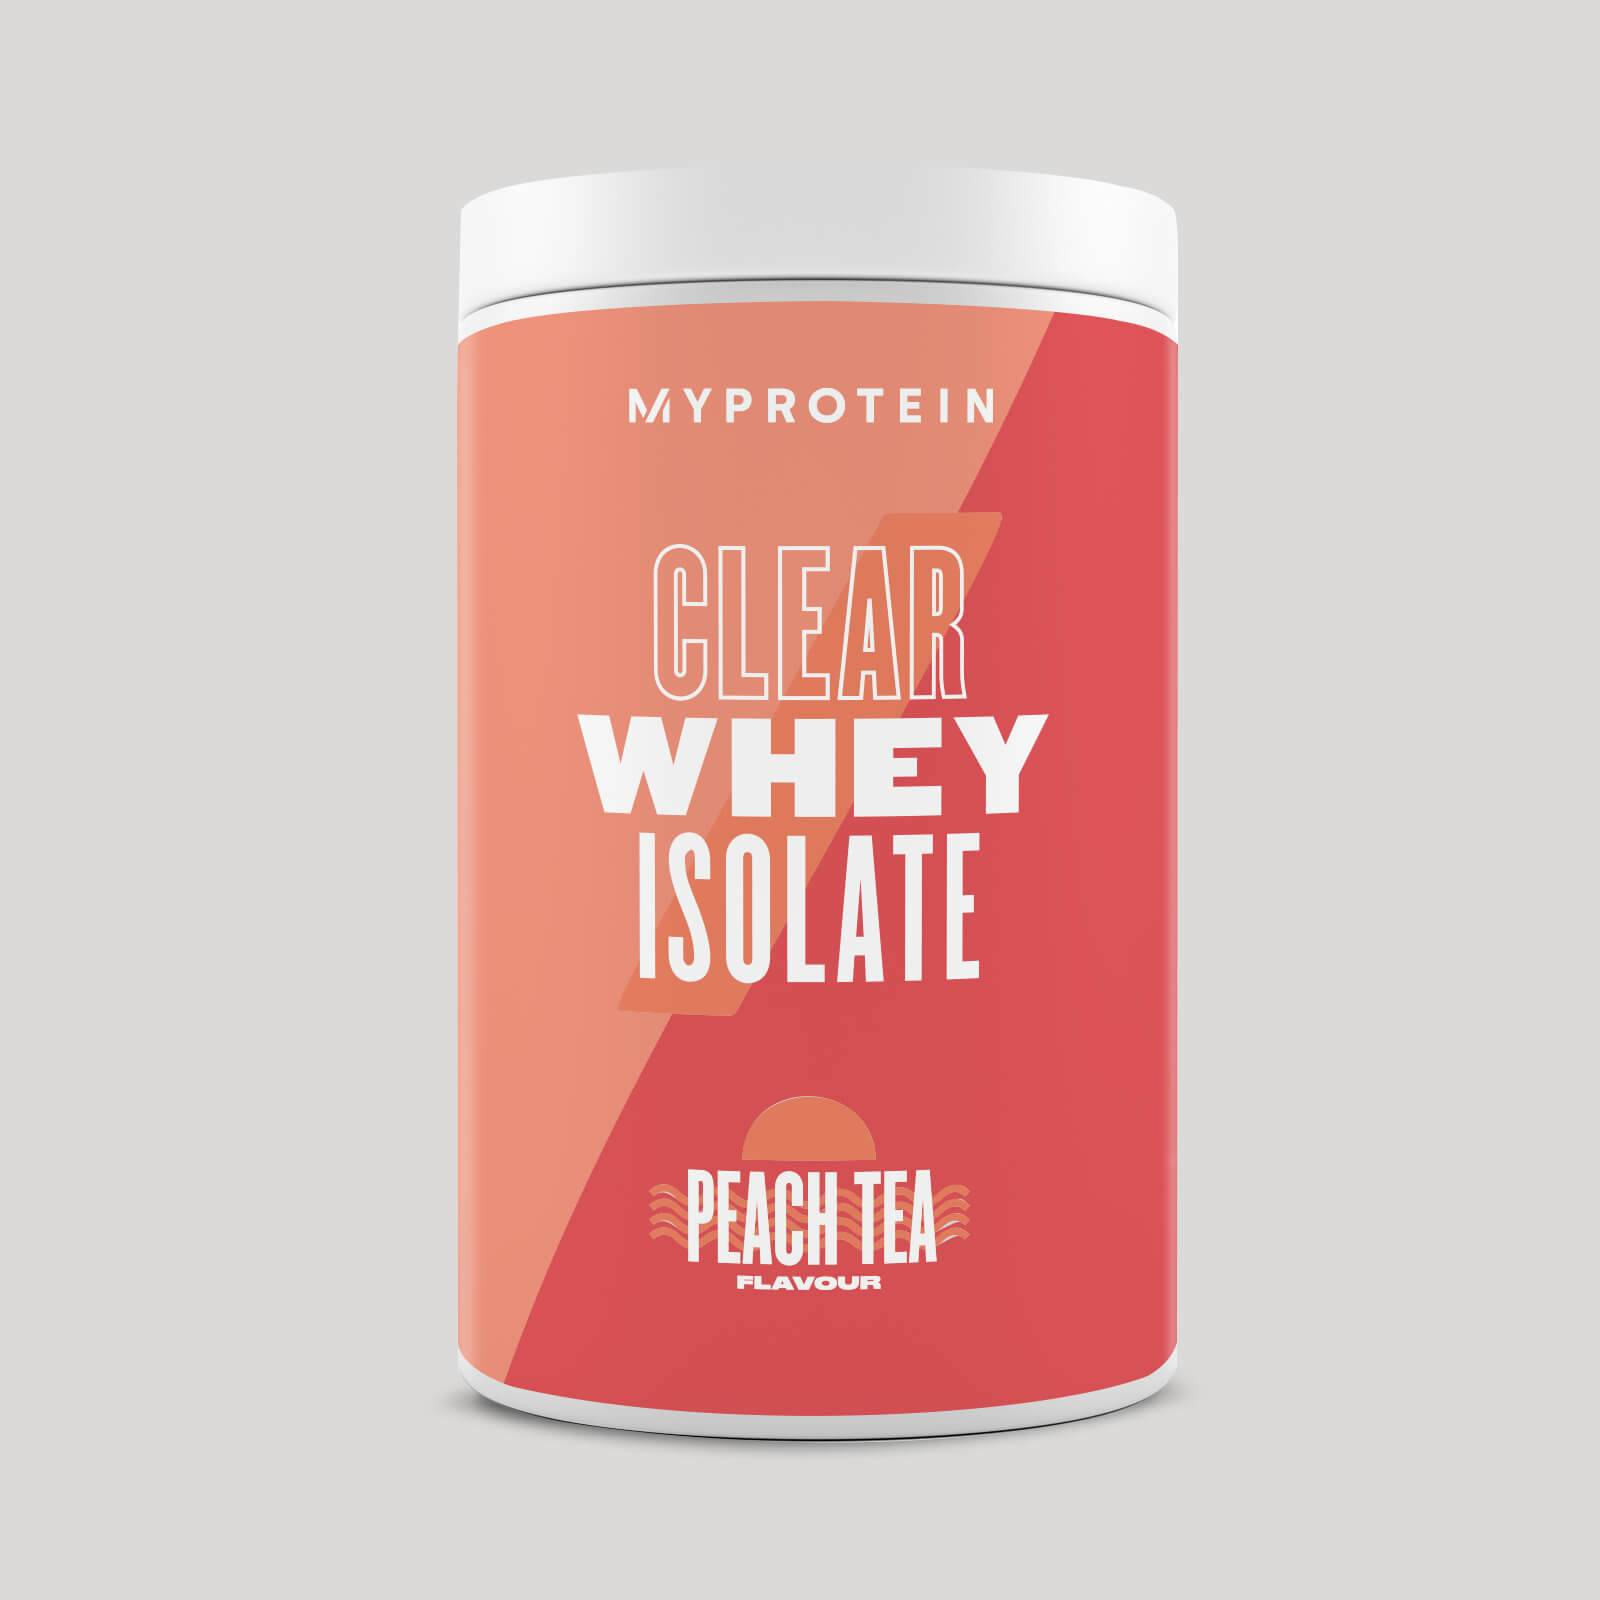 Myprotein Clear Whey Isolate - 20servings - Peach Tea